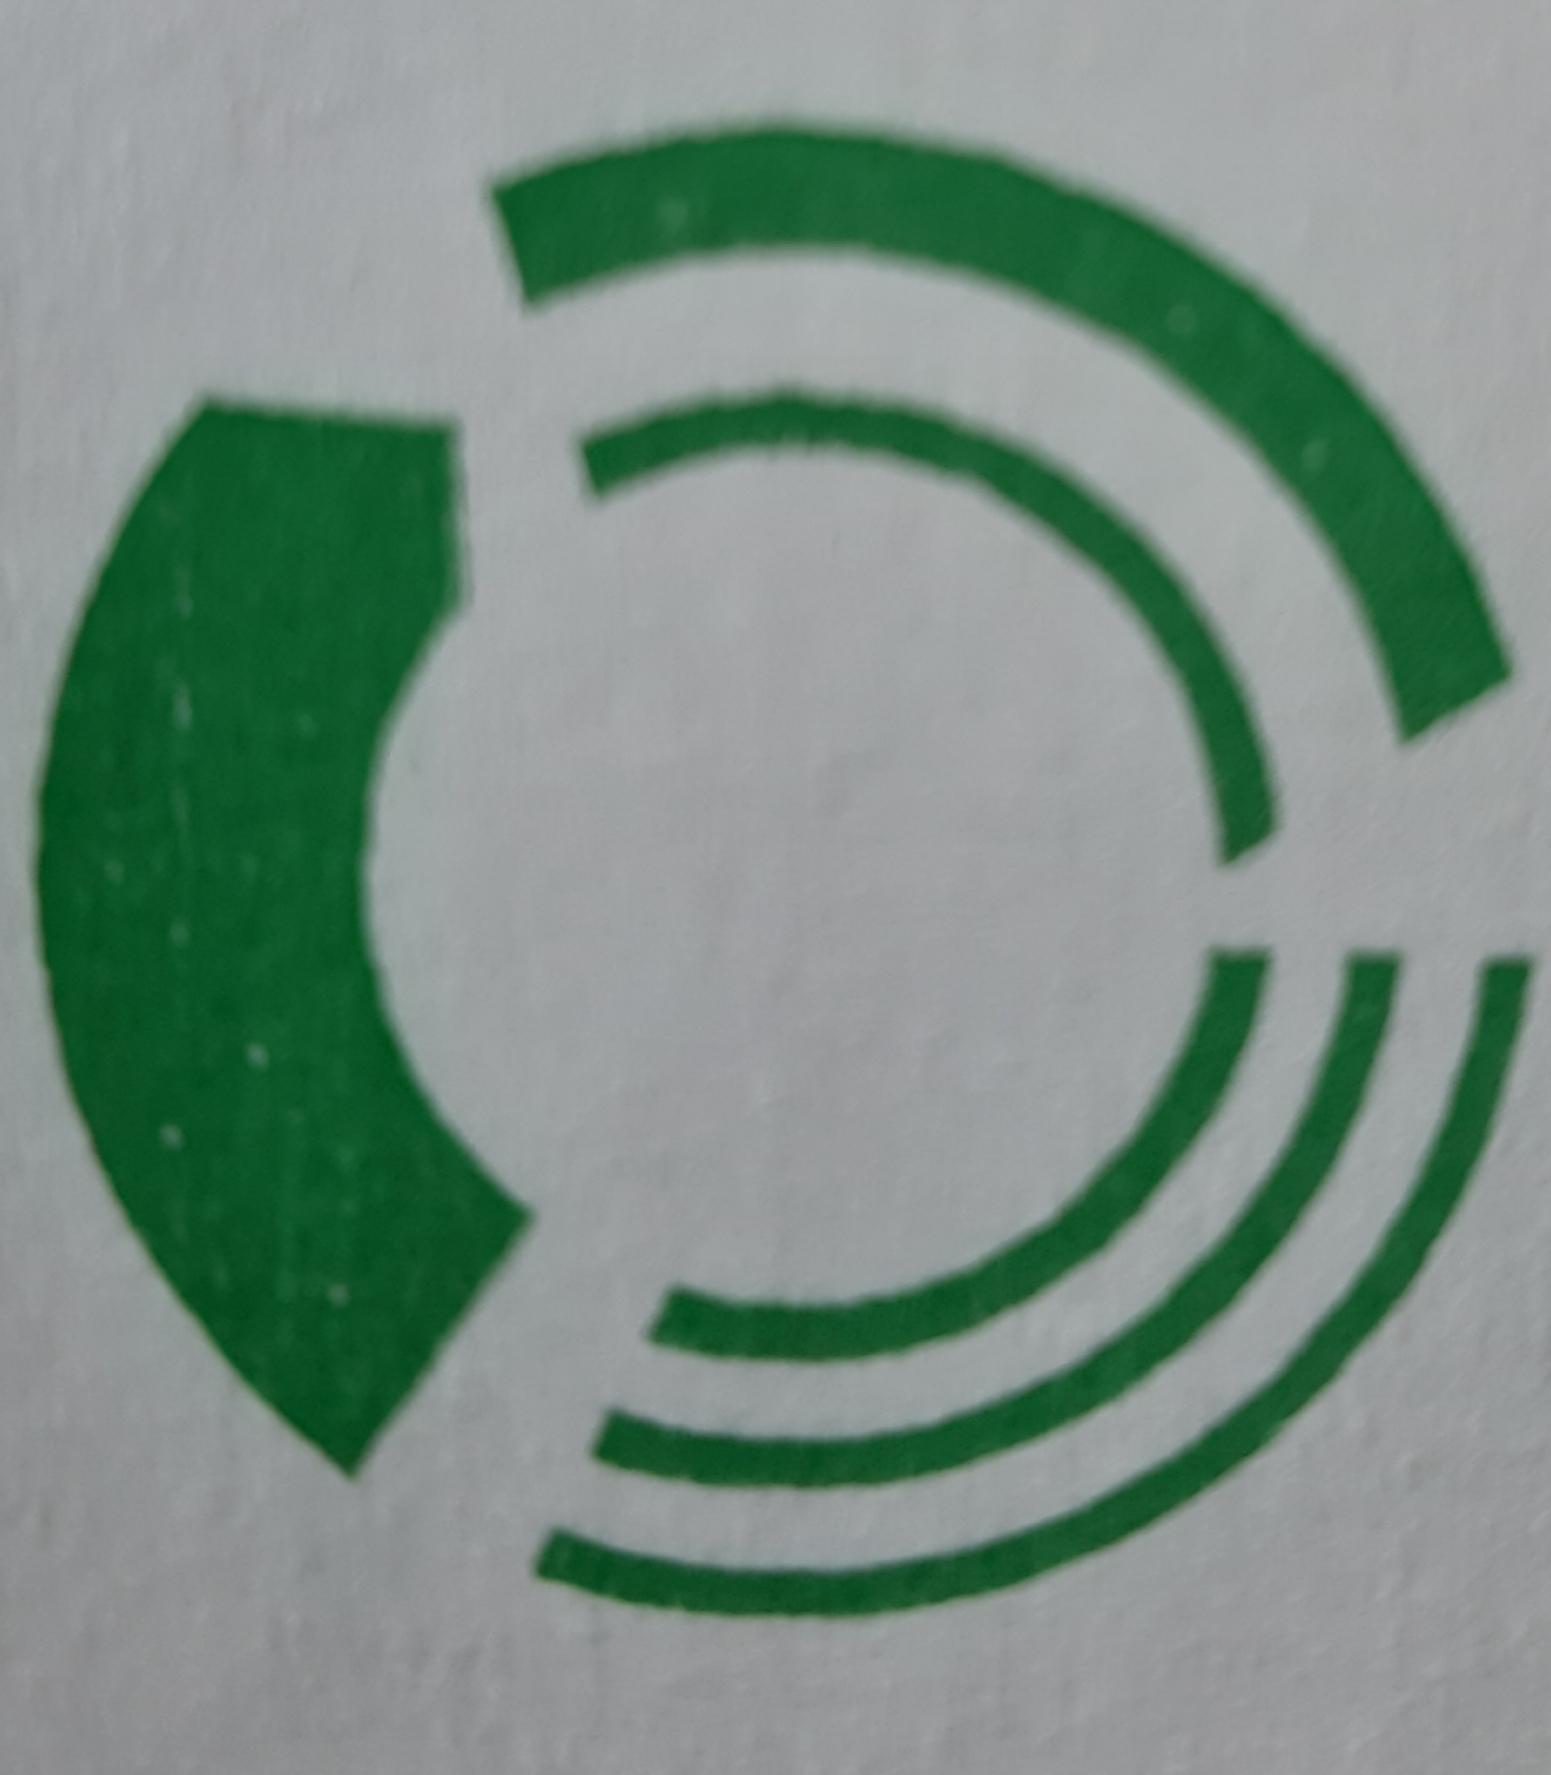 Privredno društvo za reciklažu sirovina Inos-Napredak d.o.o. Mišar